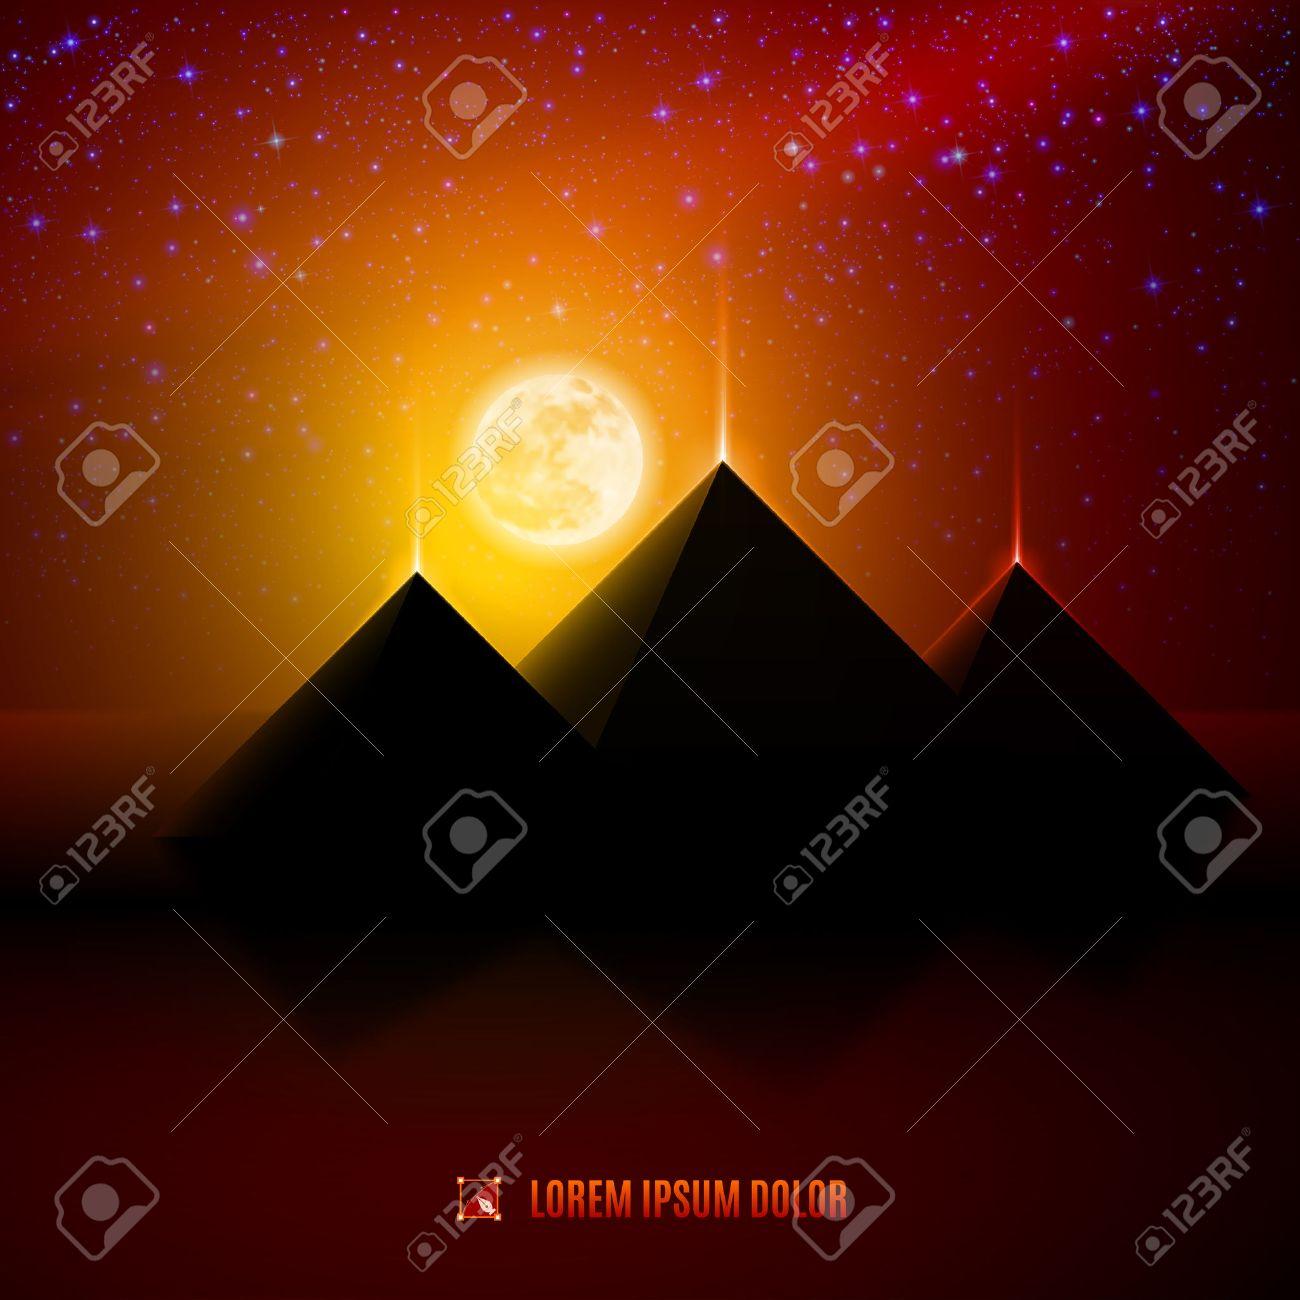 Red and orange night  egypt  desert  landscape background  illustration with moon, pyramids, landmark and stars Stock Vector - 30221760